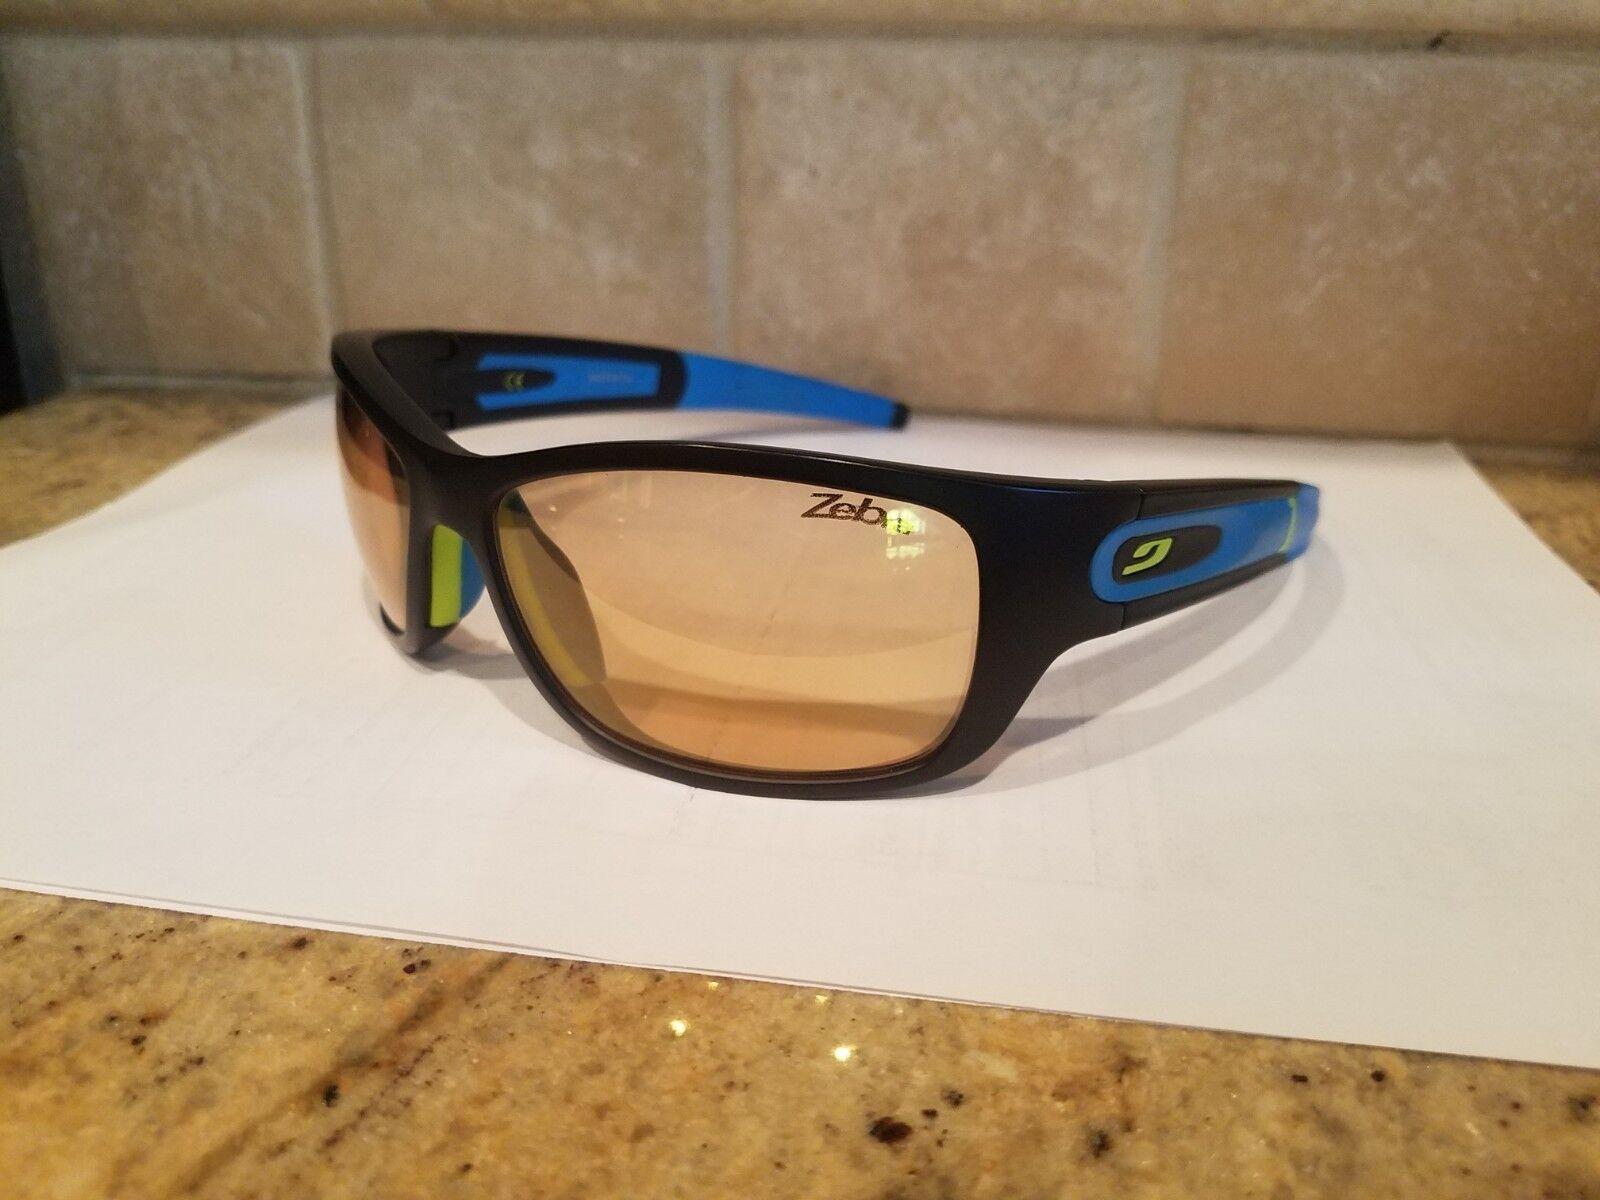 Julbo Women's Stony Sunglasses with Zebra Lenses   cheapest price